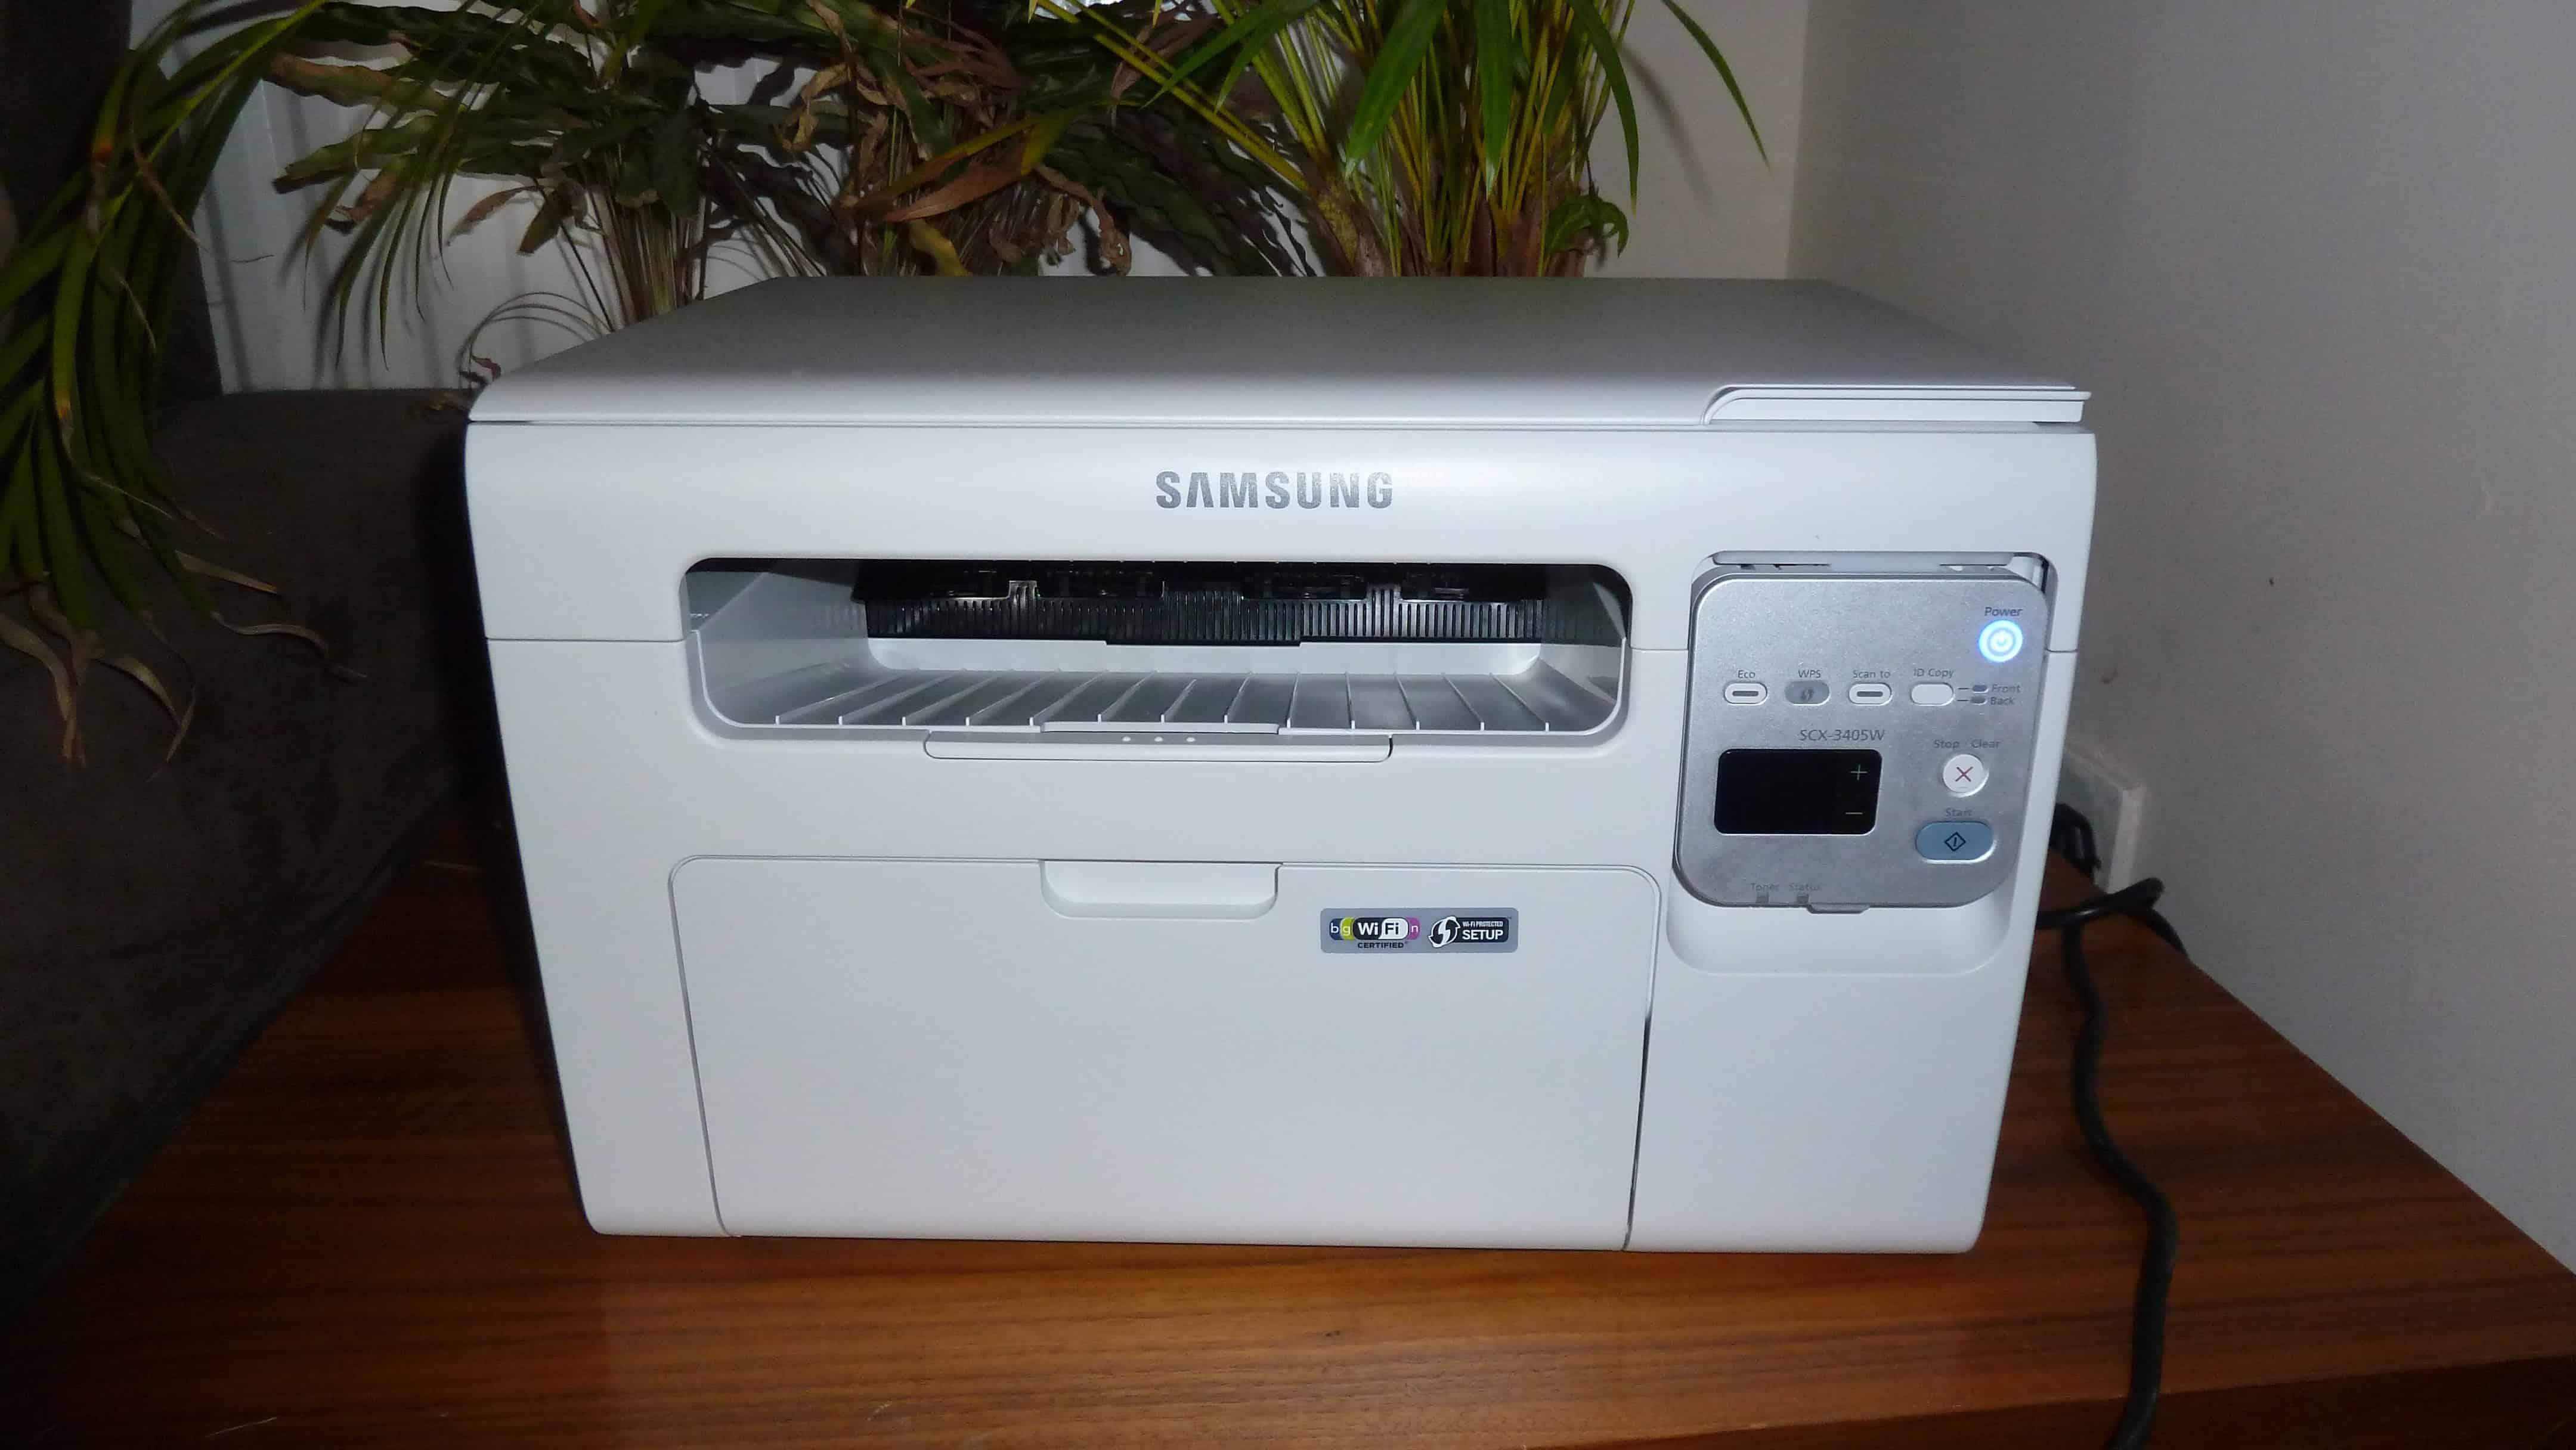 samsung scx 3405w mono wireless laser printer review ghacks tech news. Black Bedroom Furniture Sets. Home Design Ideas